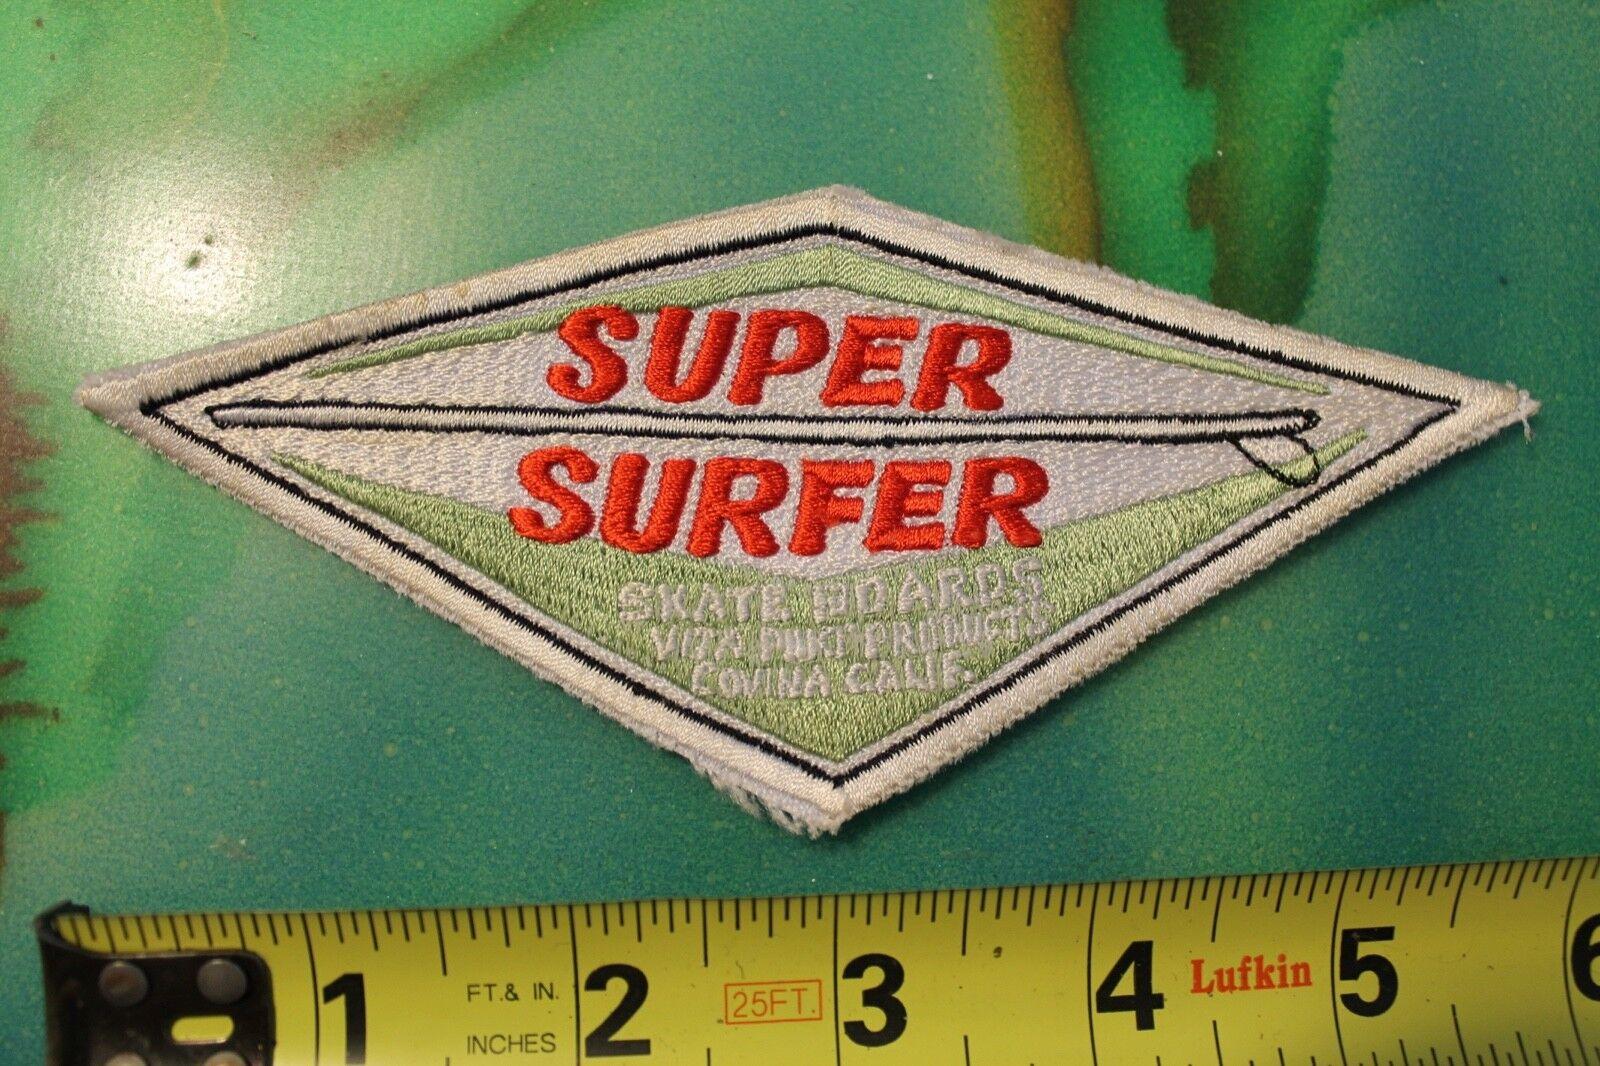 SUPER SURFER Hobie S boards Surfboard Rare Original 60's Vintage  Surf PATCH  new products novelty items